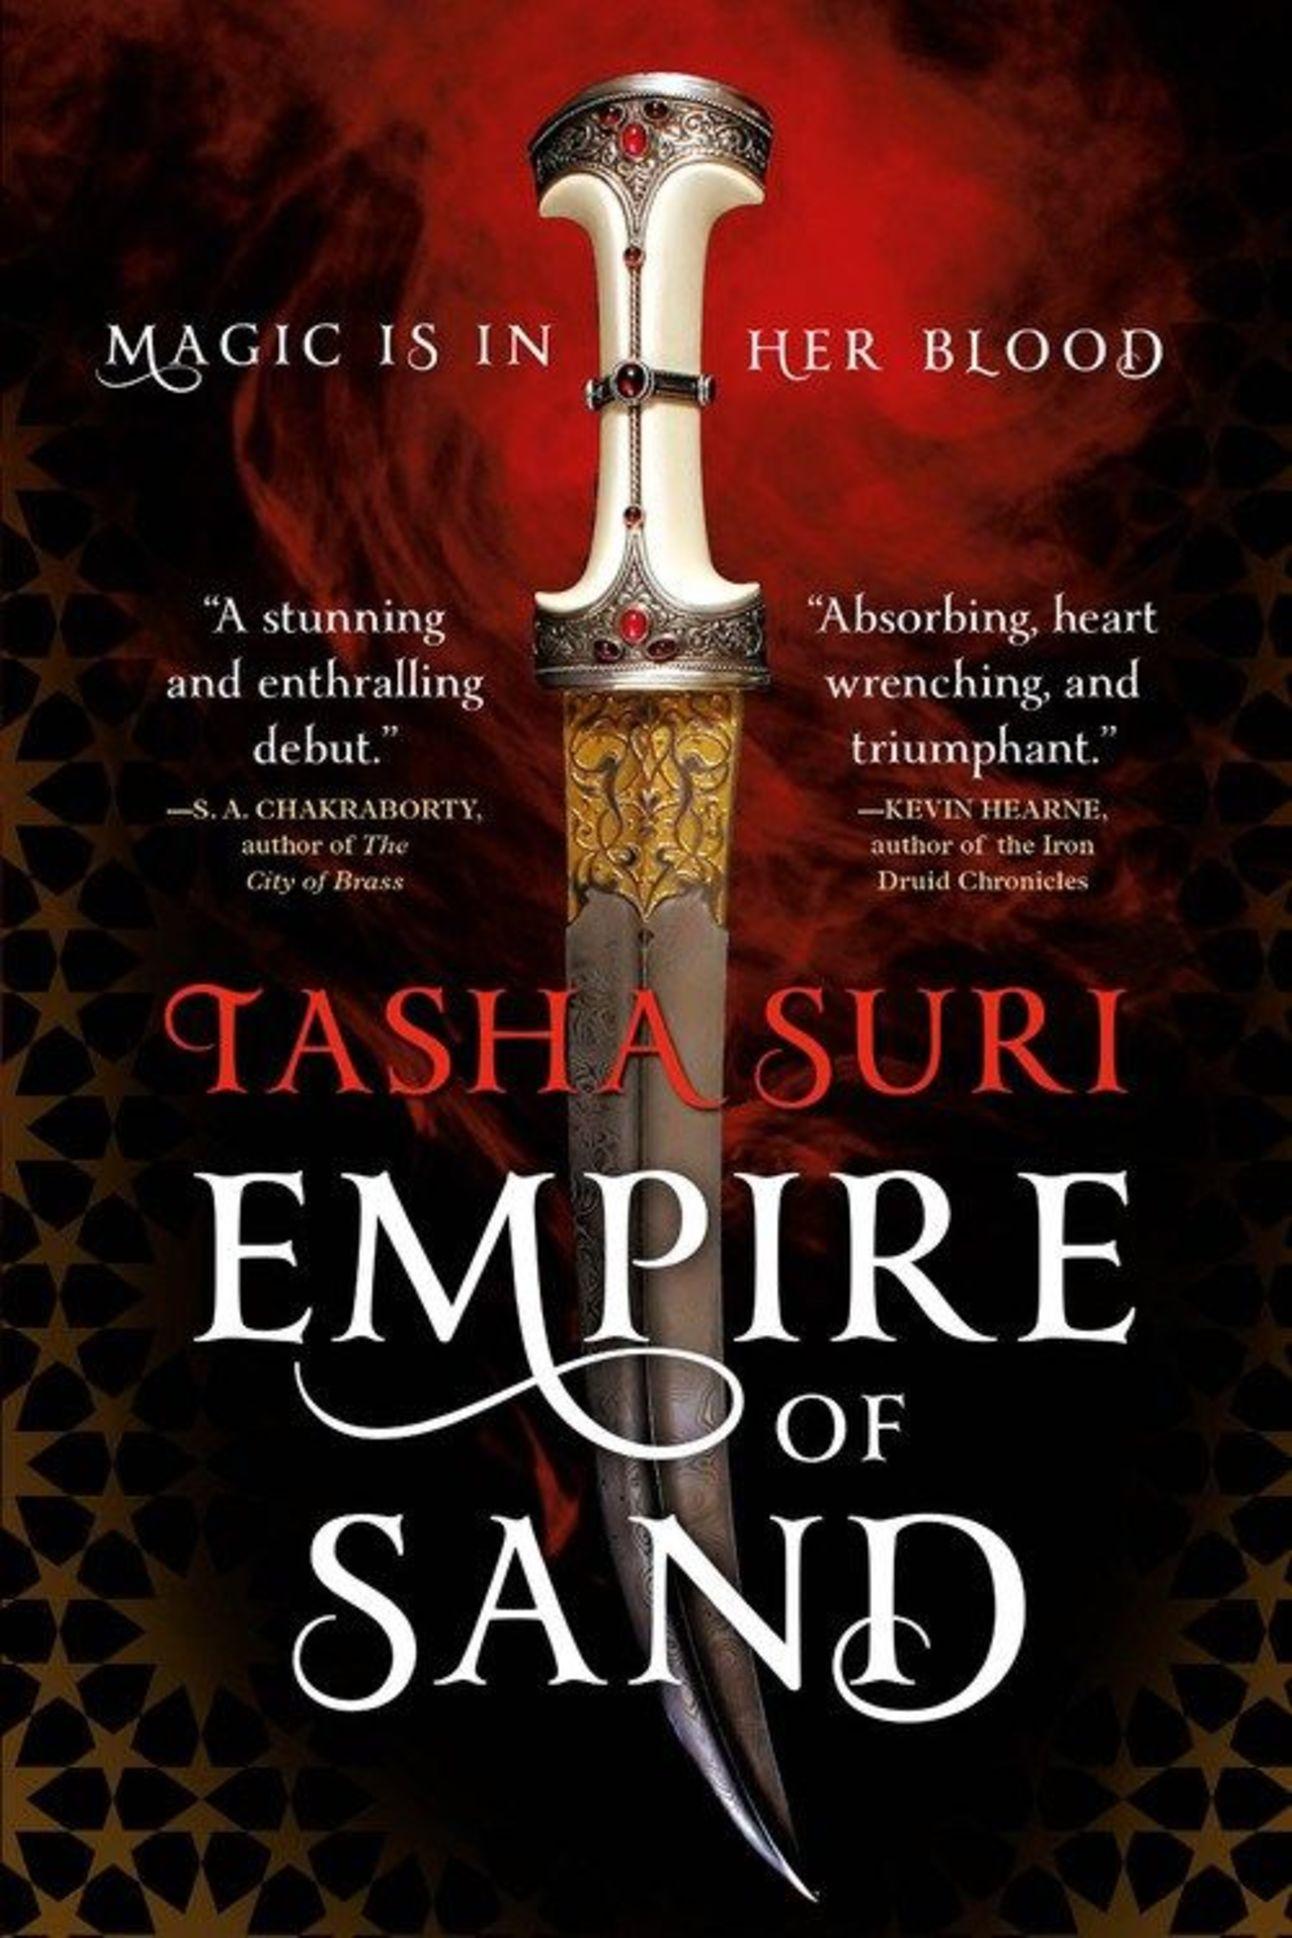 empire-of-sand-tasha-suri